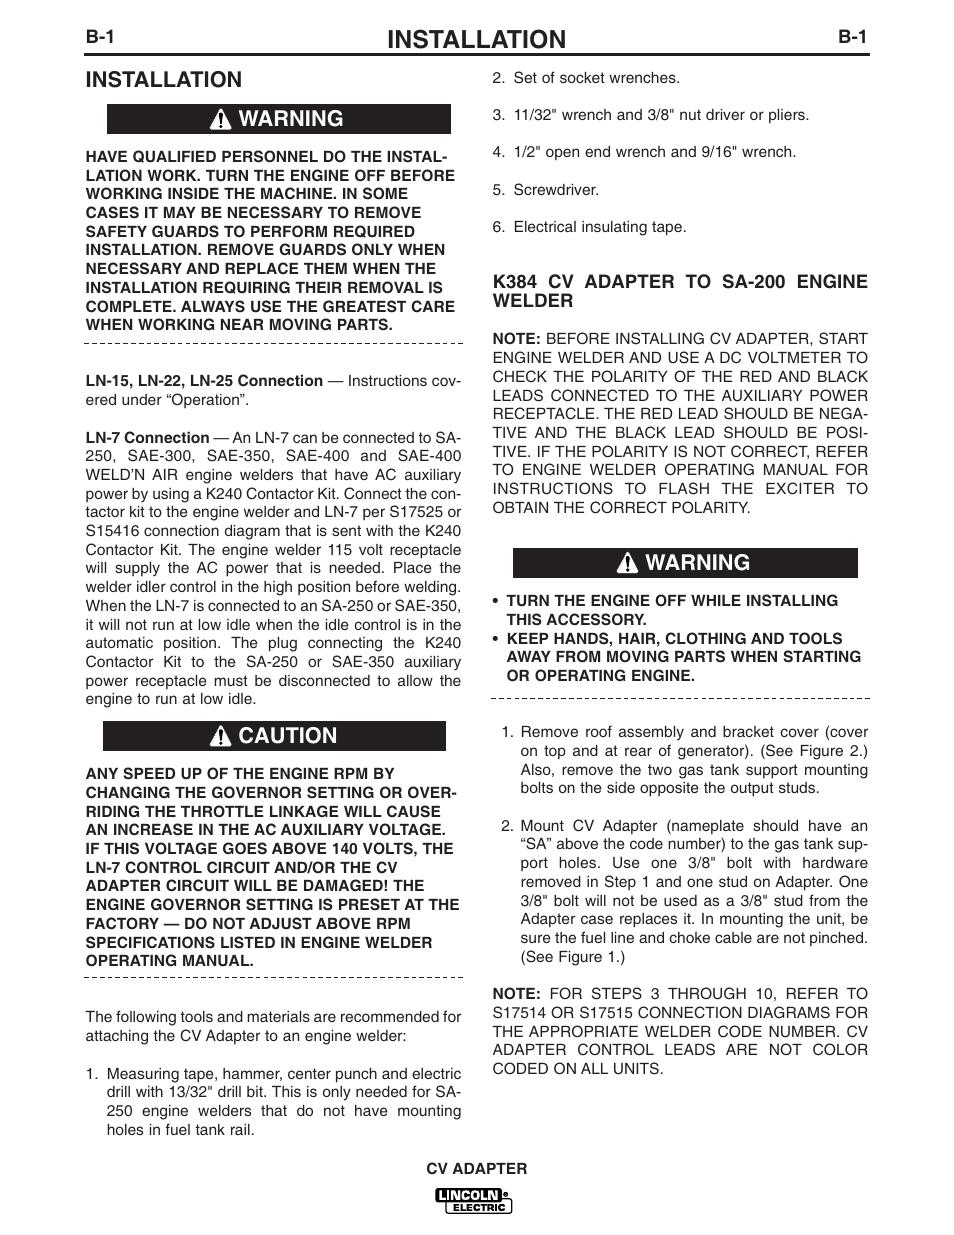 Installation, Warning caution warning | Lincoln Electric CV